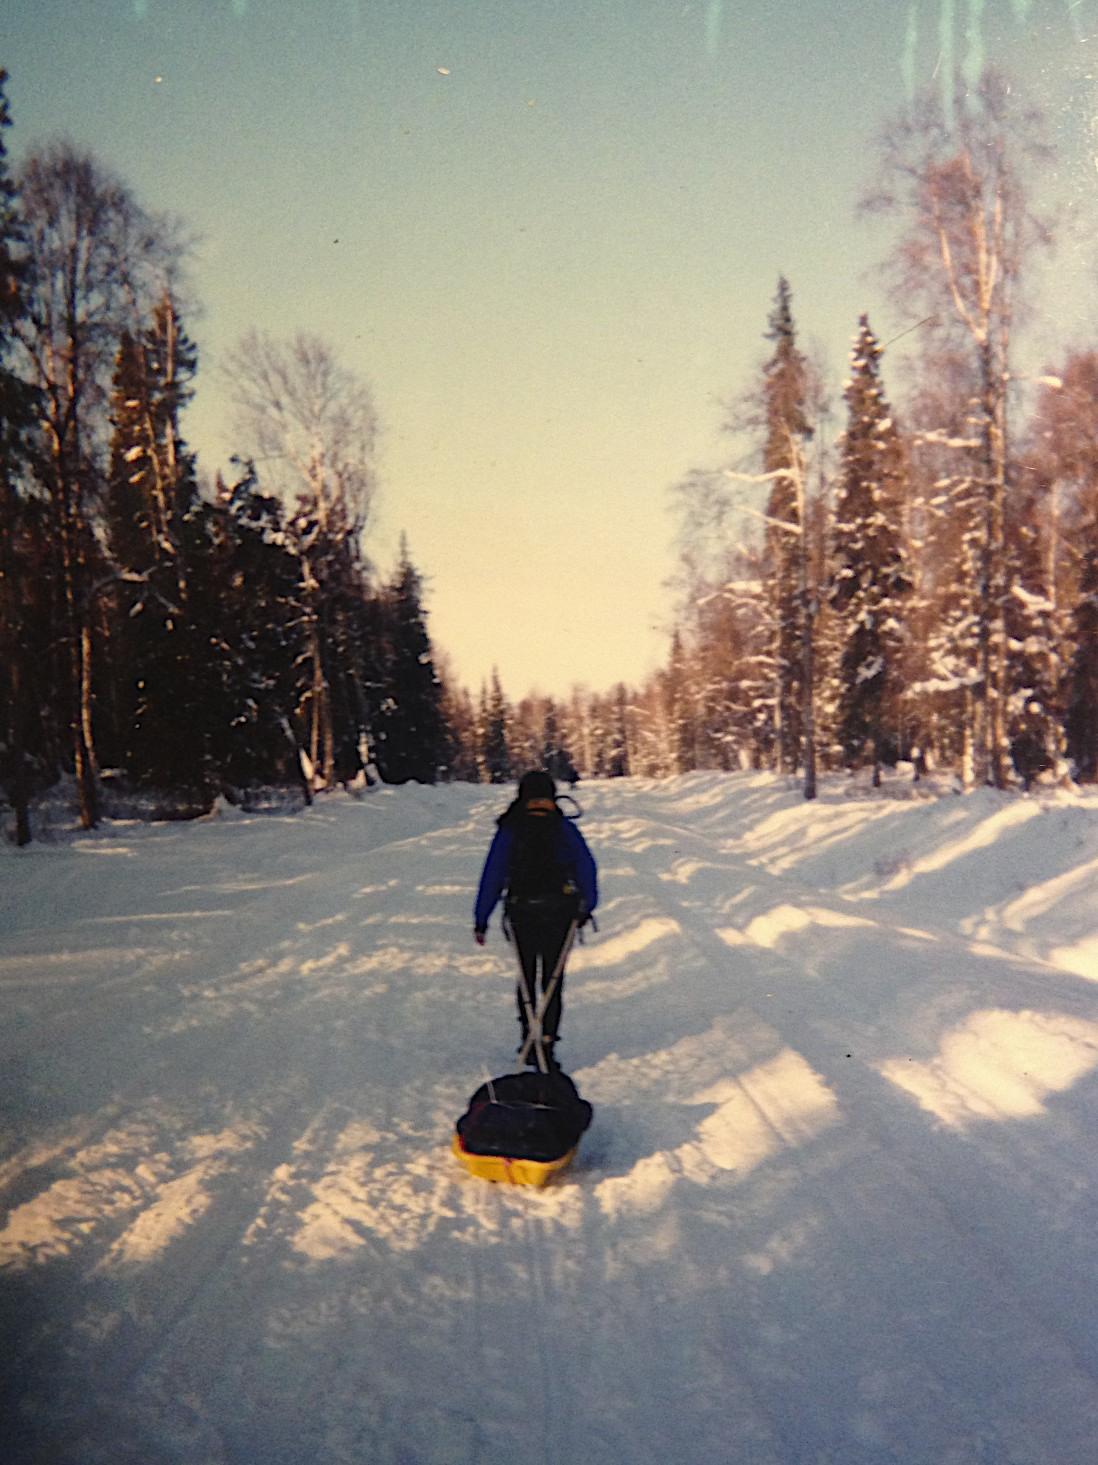 Elizabeth pulling her mandatory sled of gear during the 2000 Susitna 100 in Alaska.